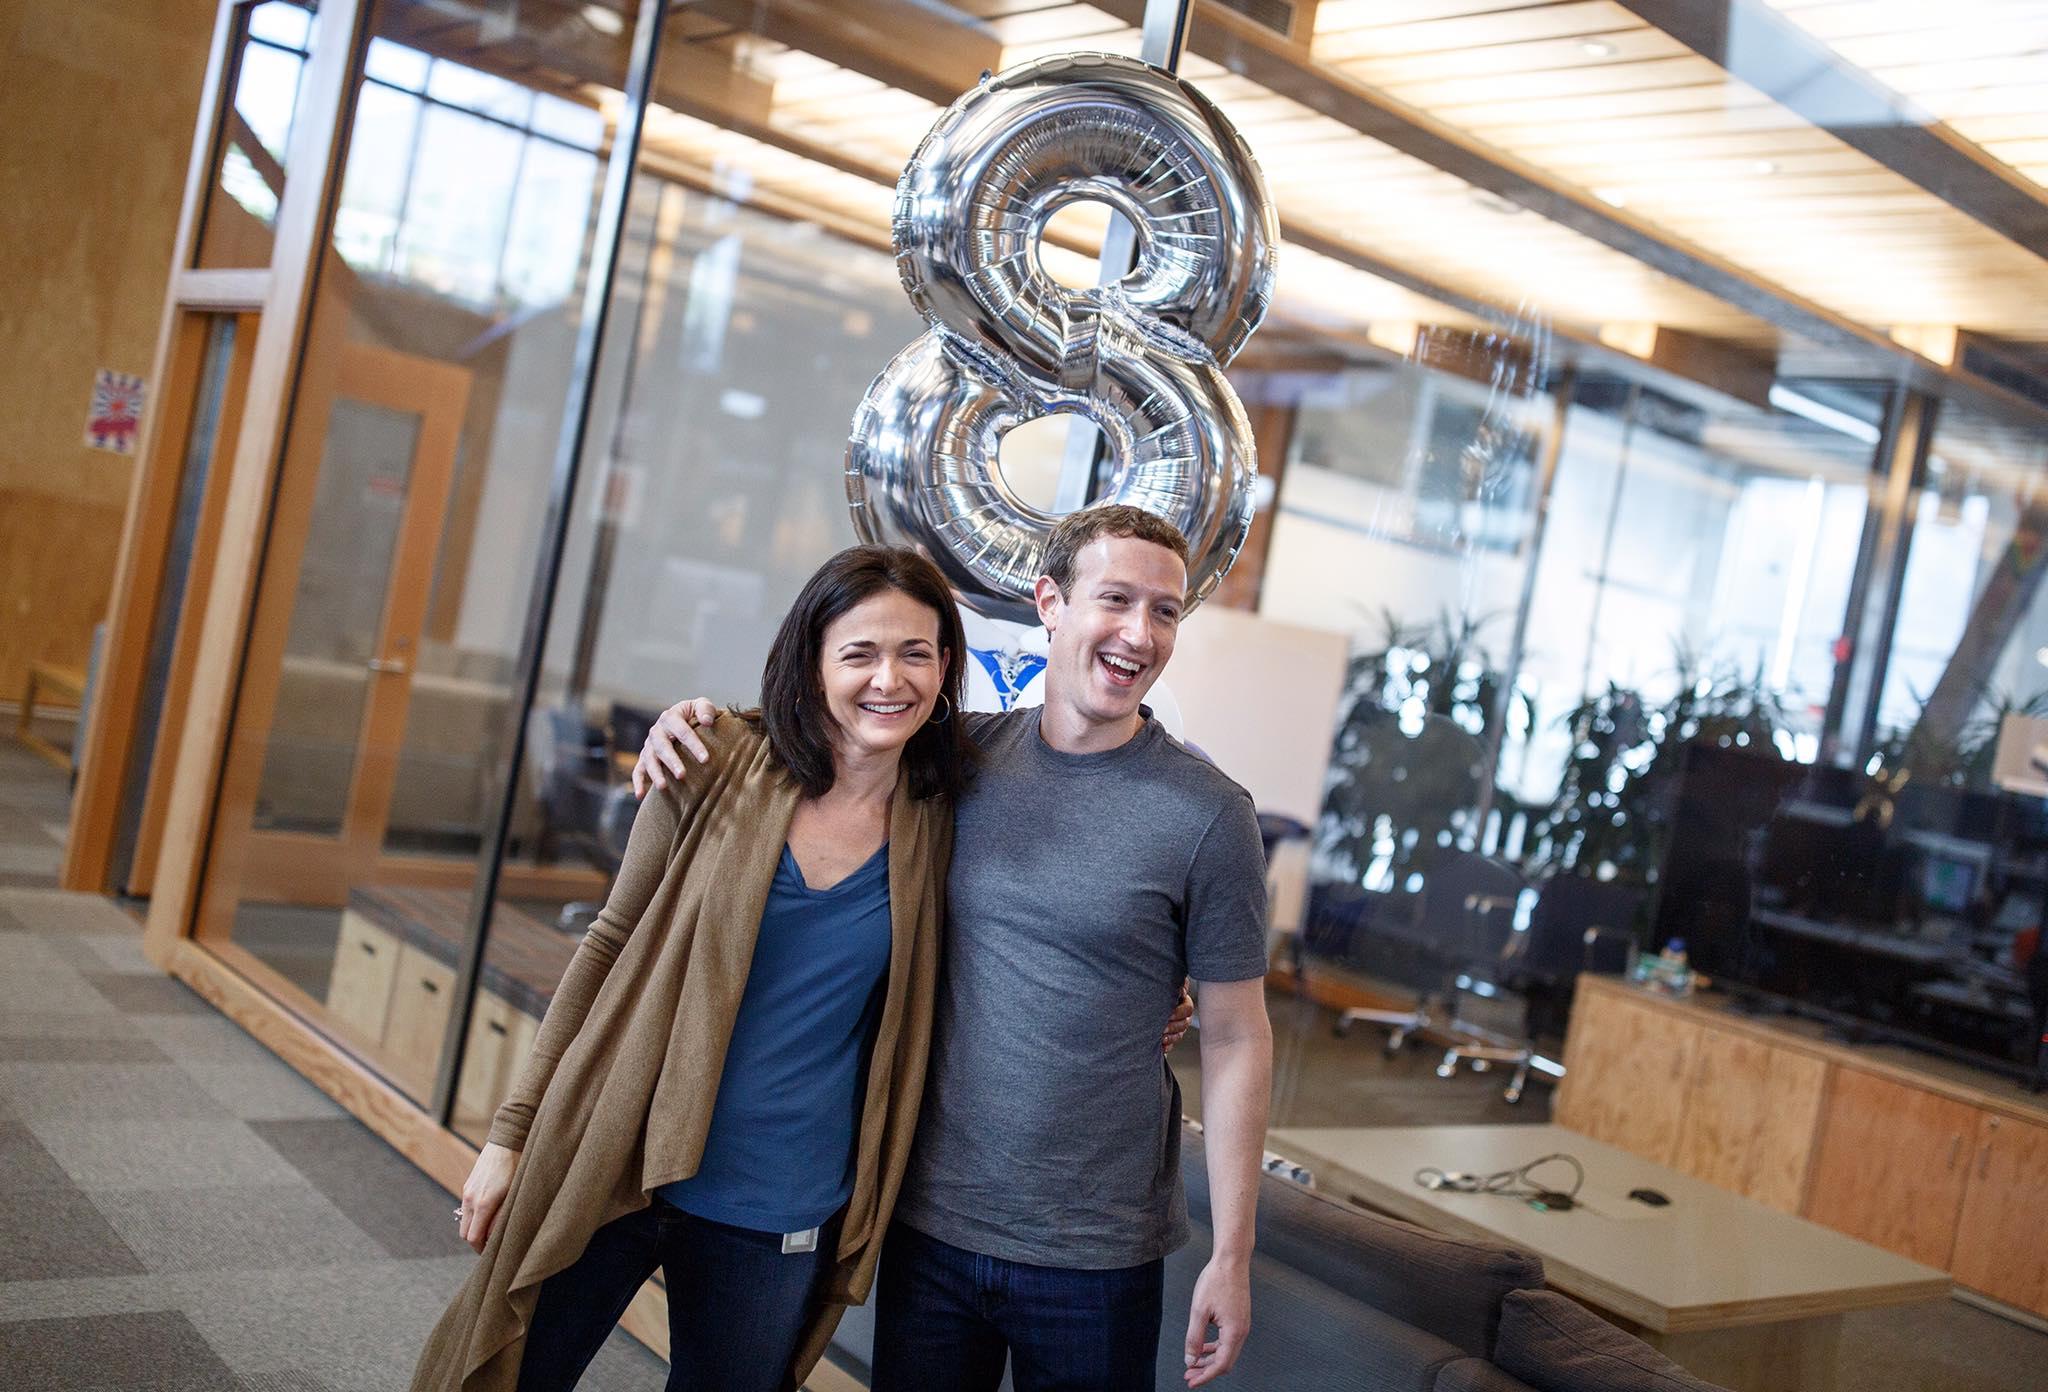 Sheryl Sandberg กับเจ้านาย Mark Zuckerberg - ภาพจาก Facebook